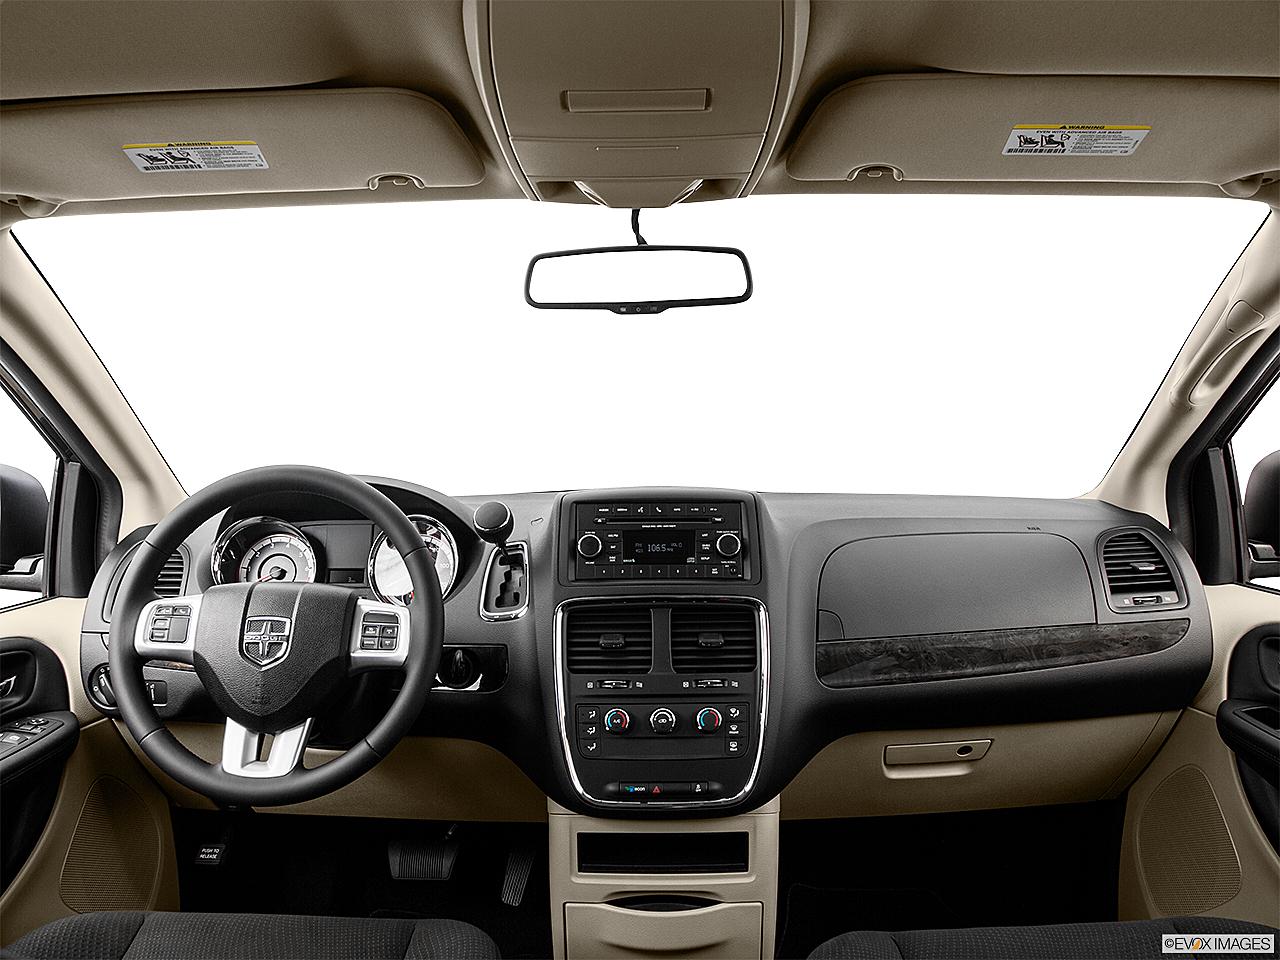 2016 Dodge Grand Caravan American Value Package Centered Wide Dash Shot